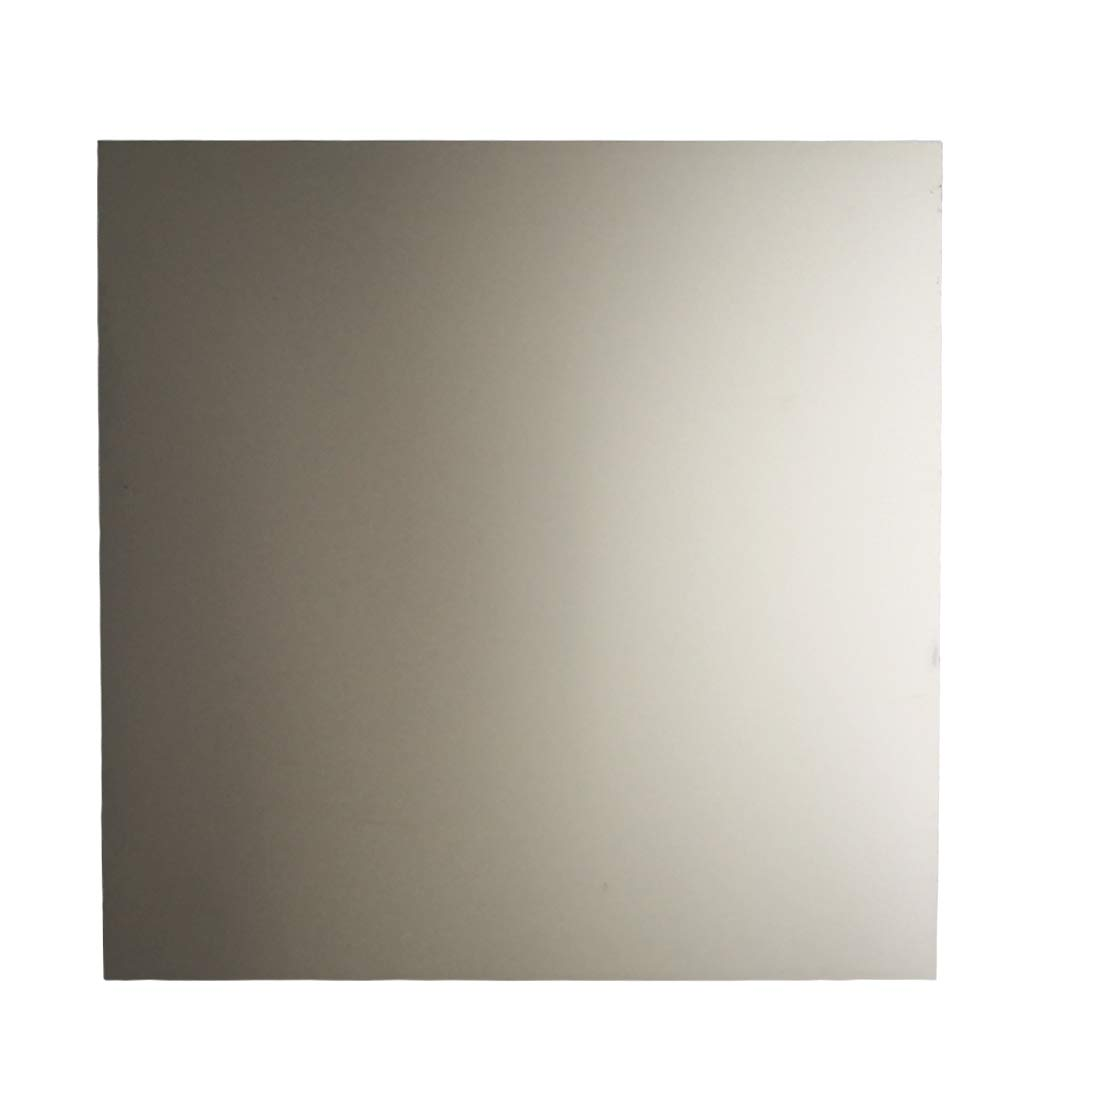 AbbottoKaylan 0.237 Inch Thick 3003 H24 Aluminum Sheet 12 x 12 Aluminum Plate